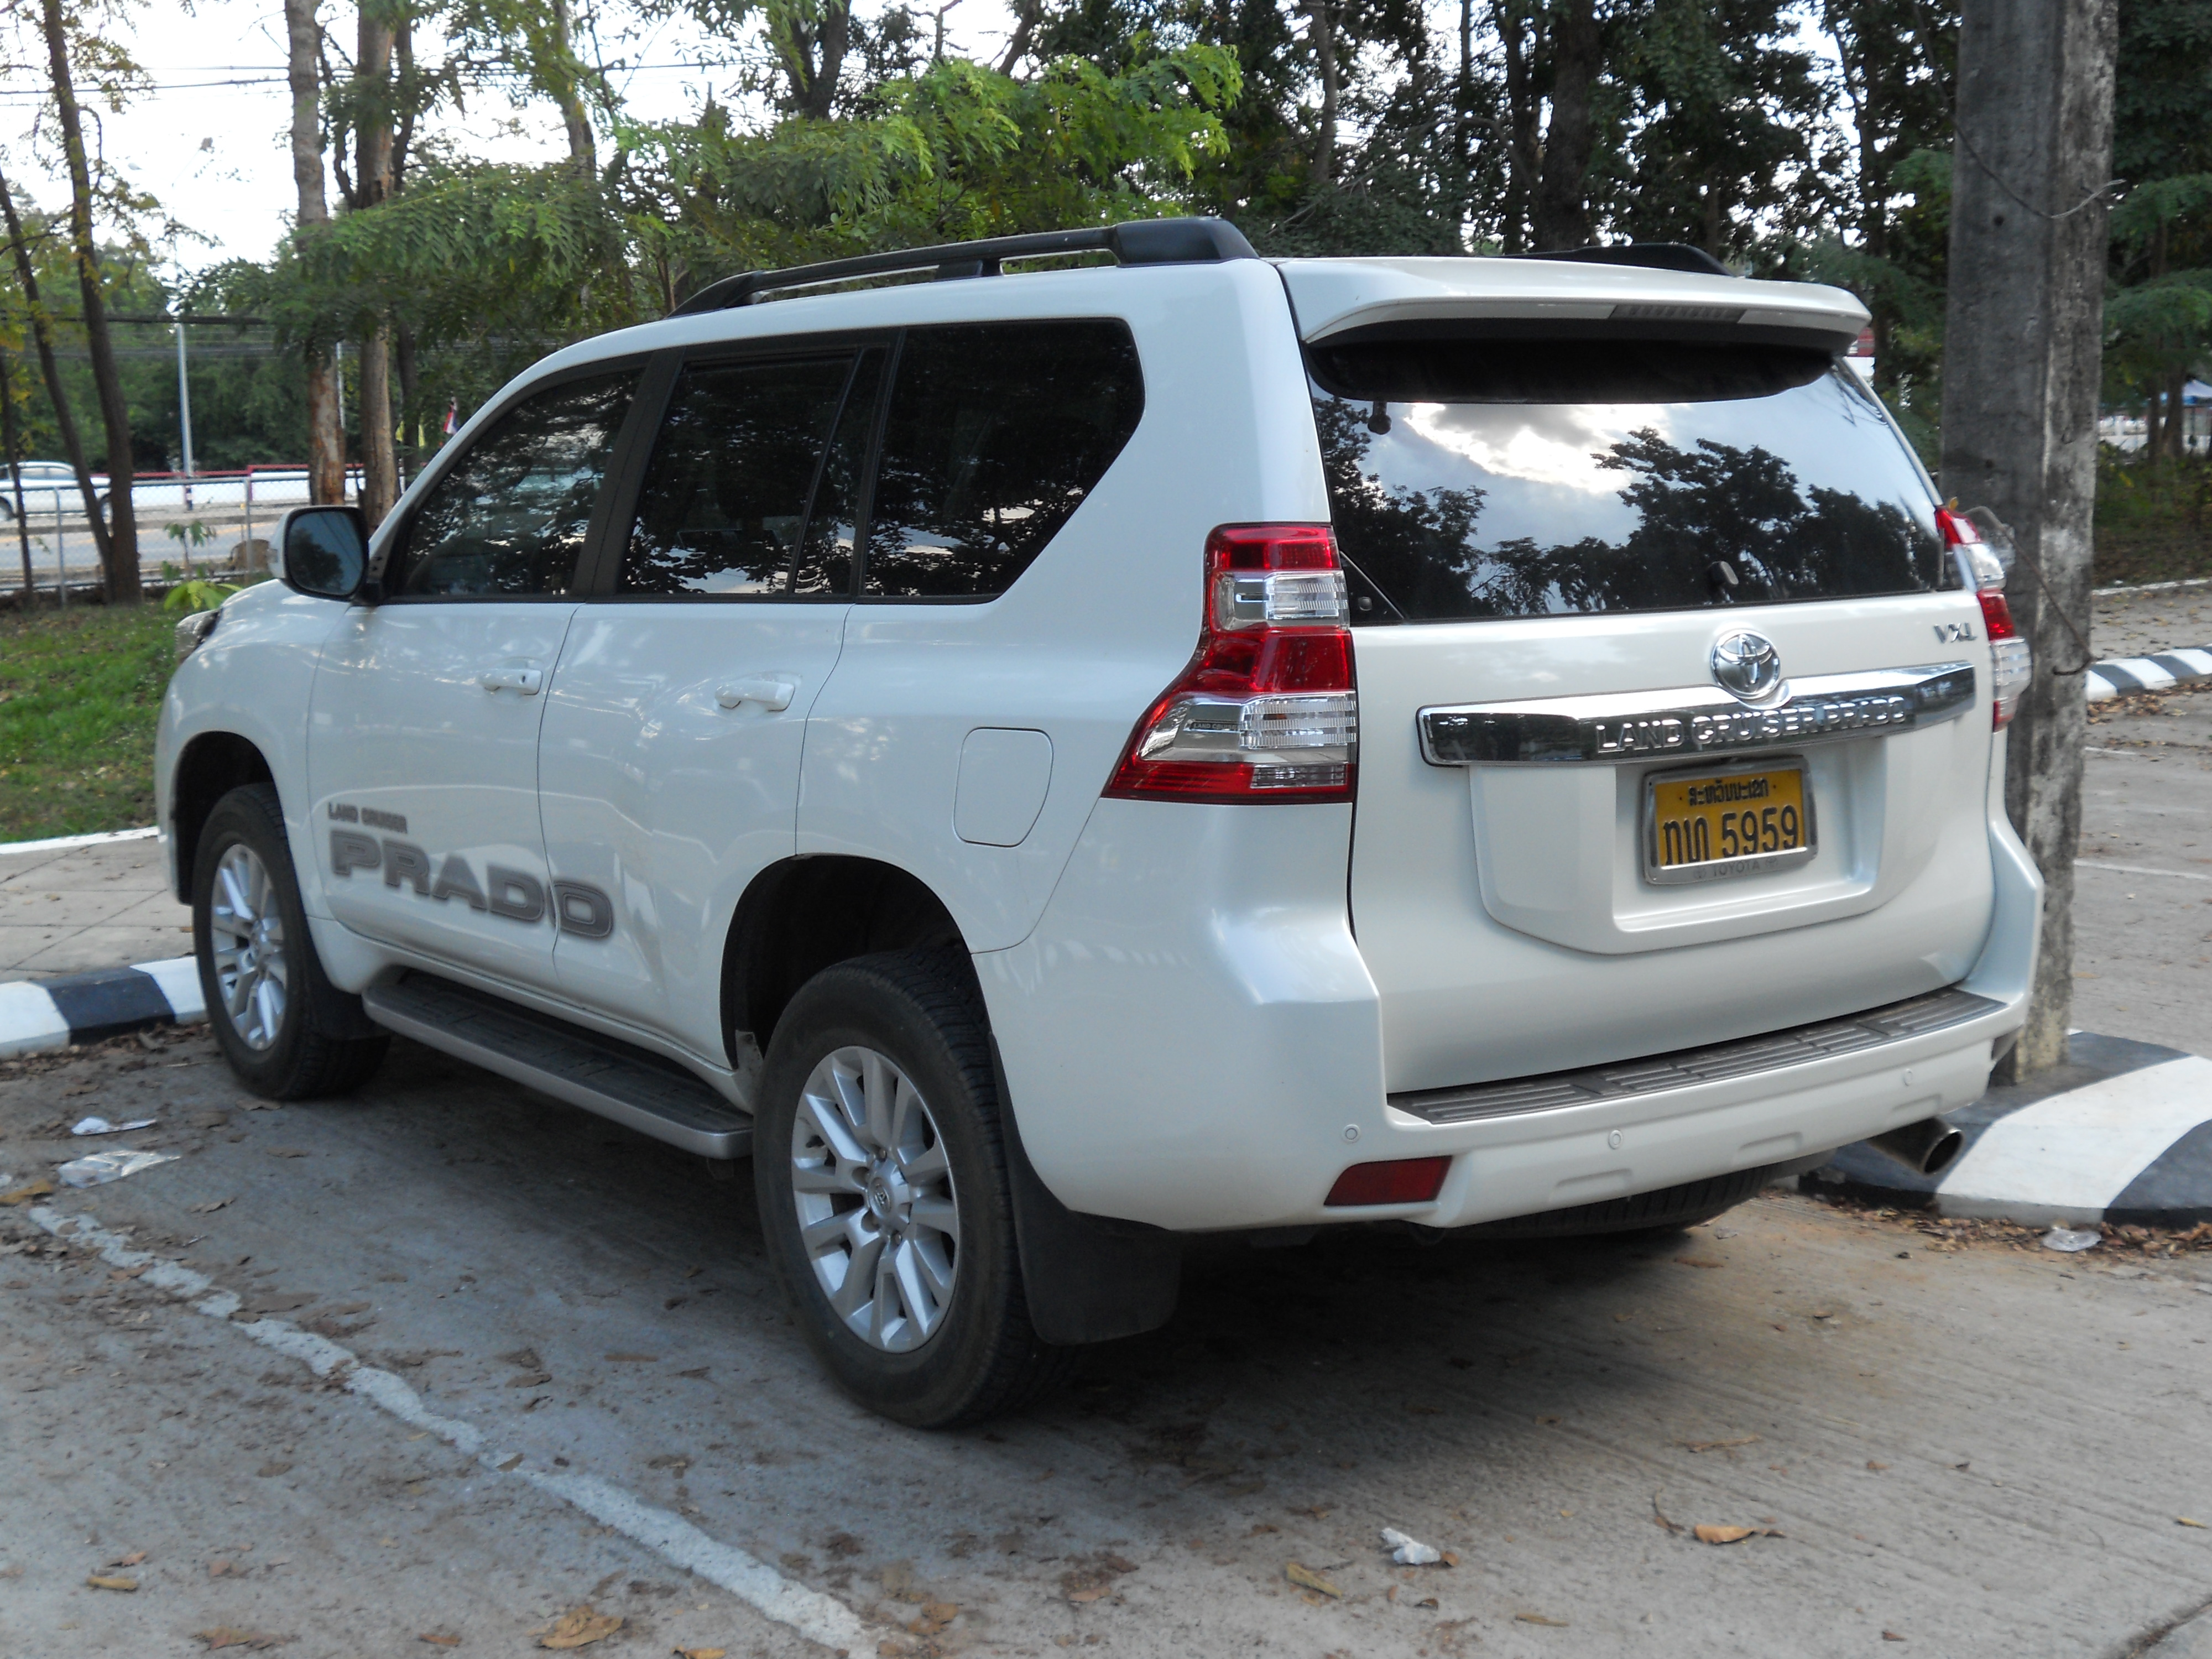 Kelebihan Kekurangan Toyota Land Cruiser 2013 Spesifikasi